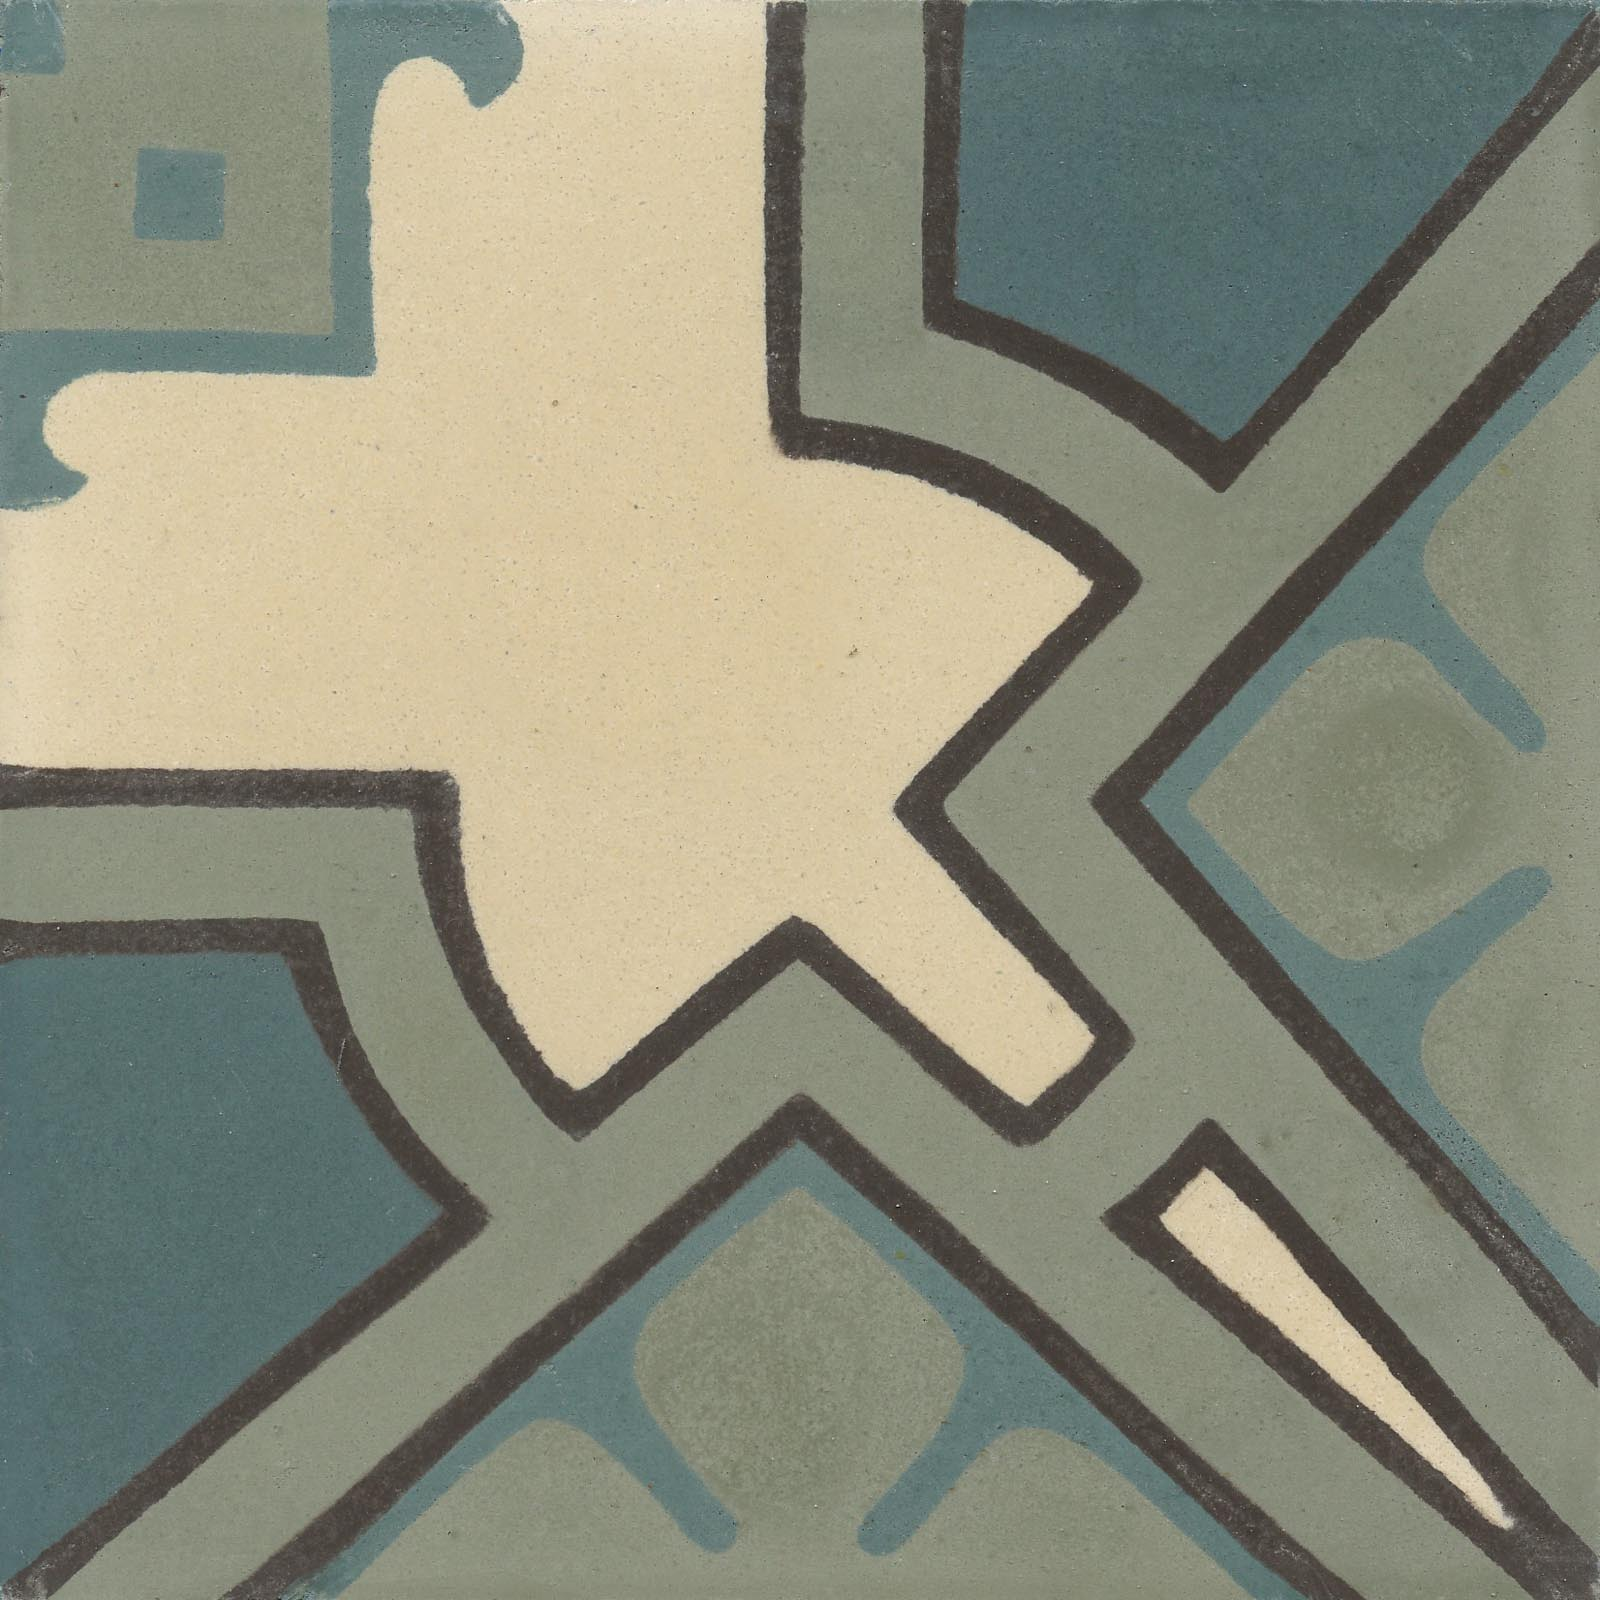 VIA_54060Zementmosaikplatten-VIA-GmbH | 51060/141